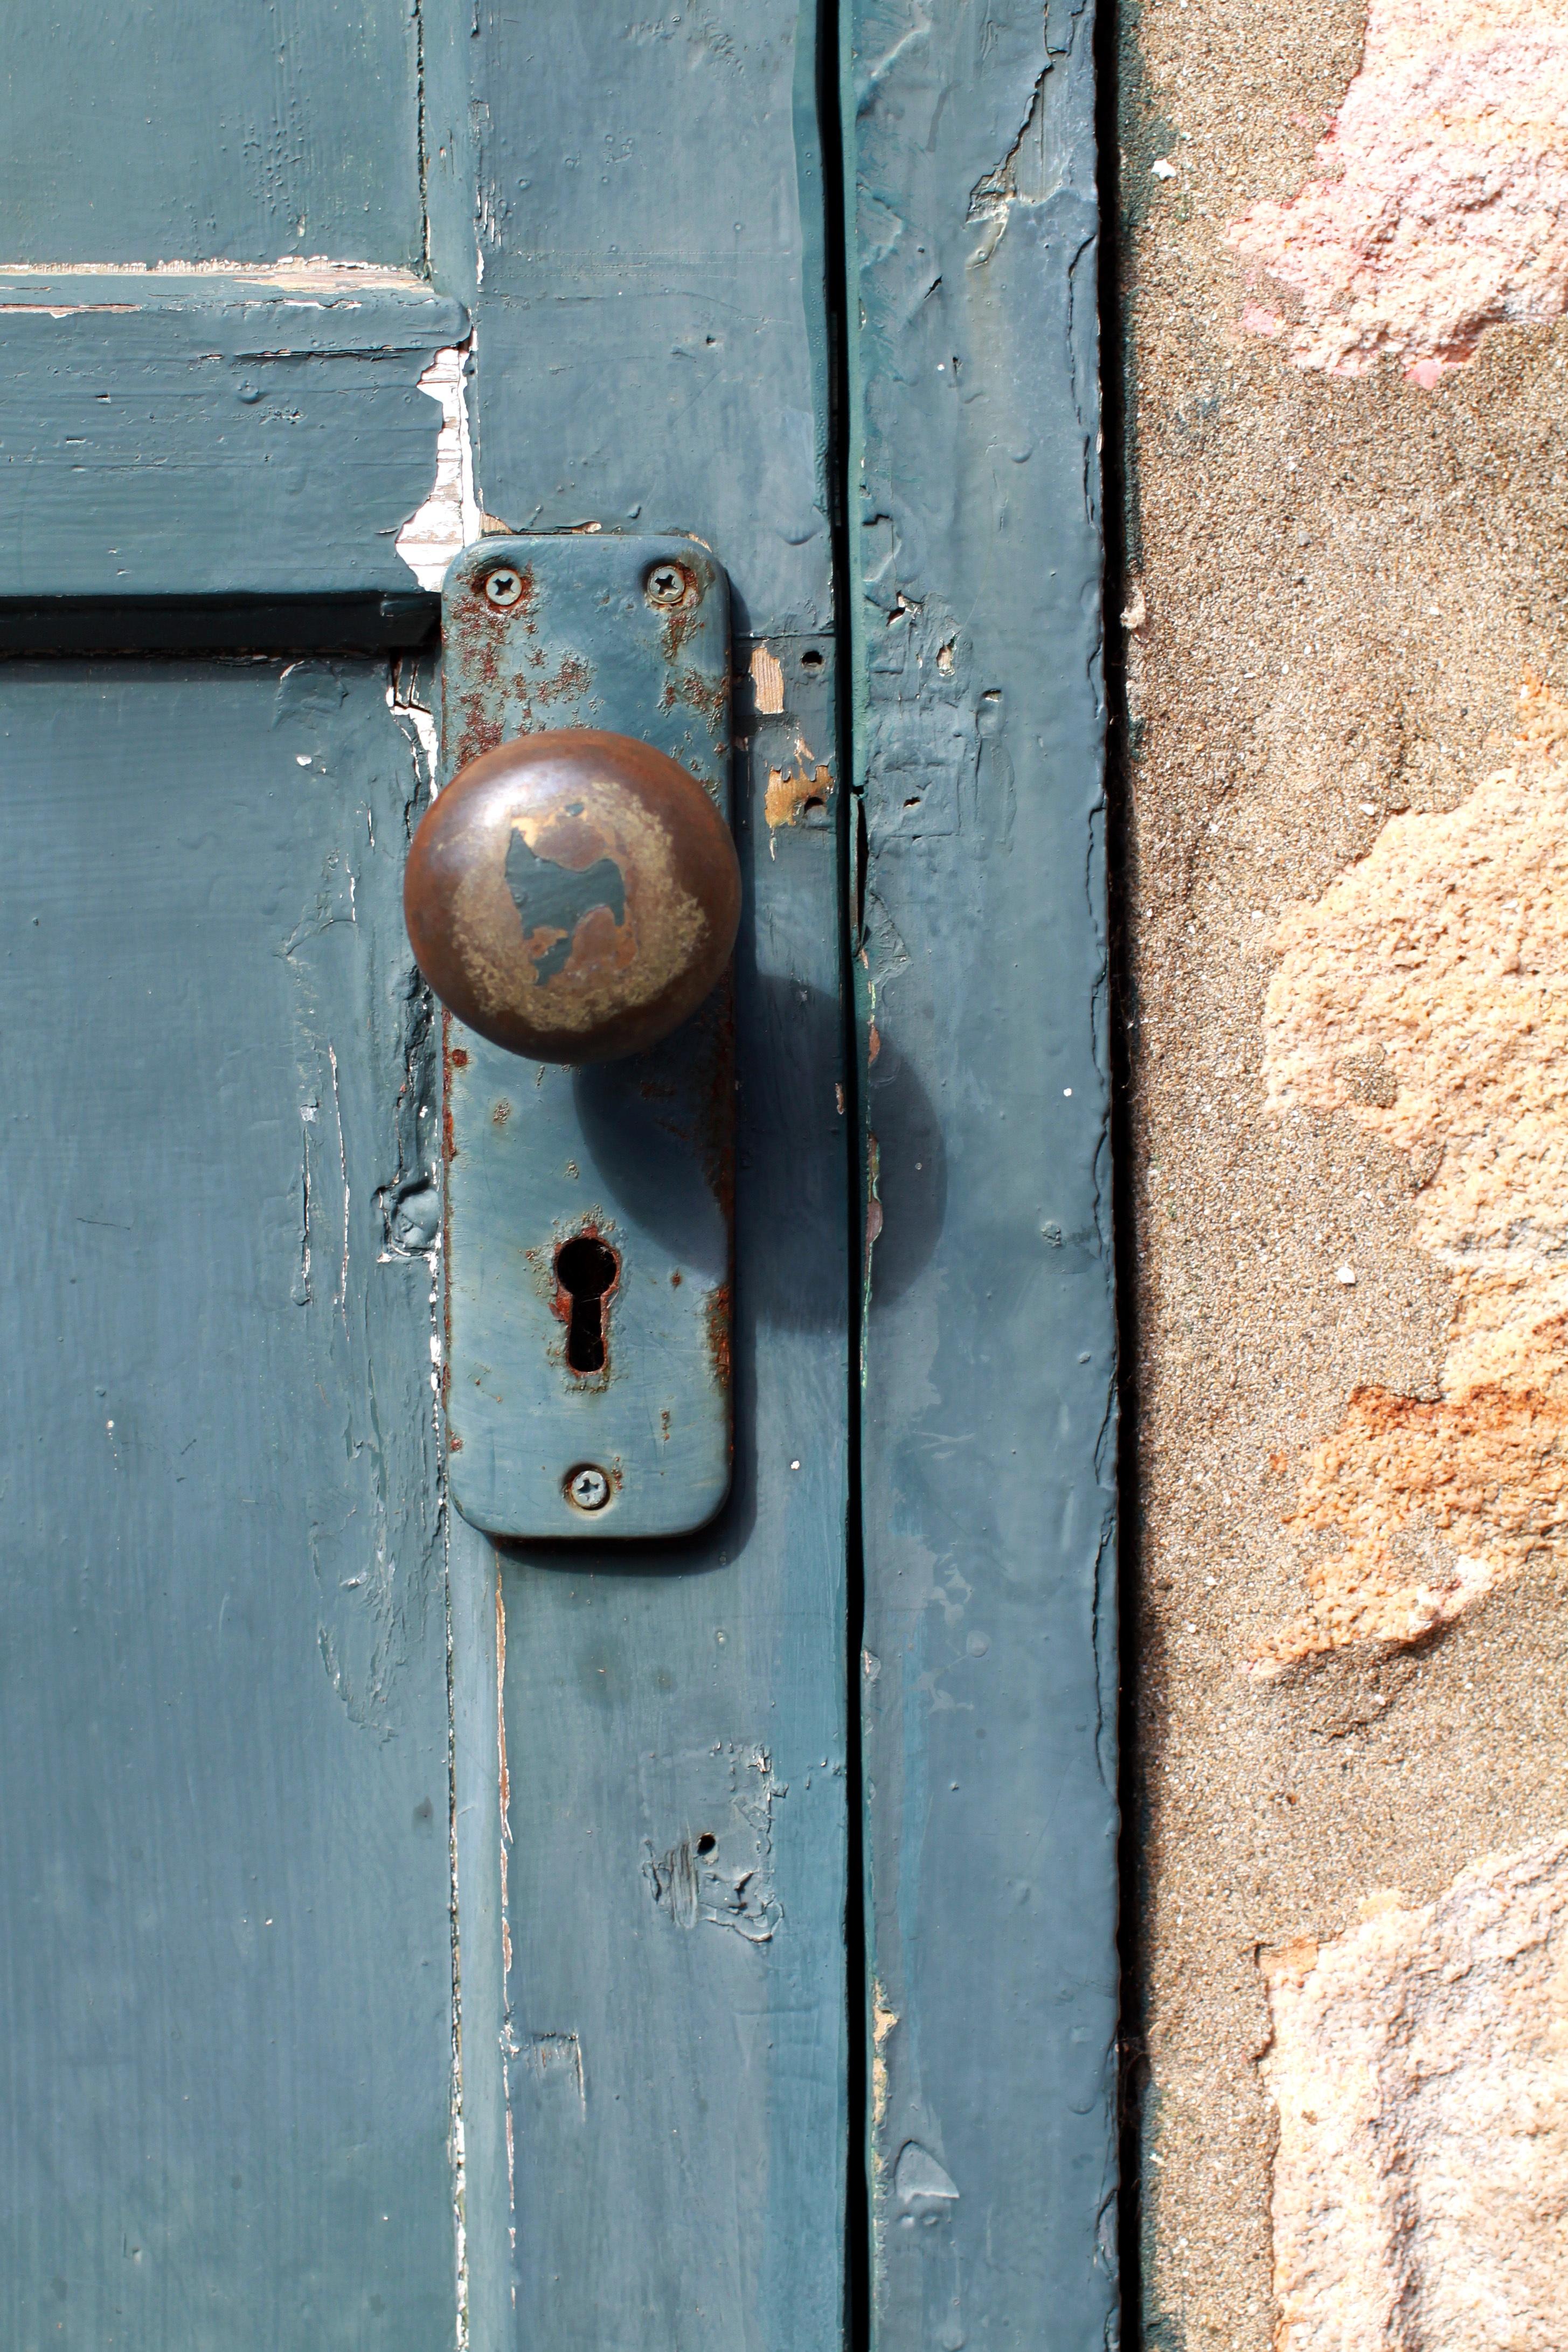 Wood Number Wall Color Ancient Blue Door Iron Lock Taiwan Keyhole Shape